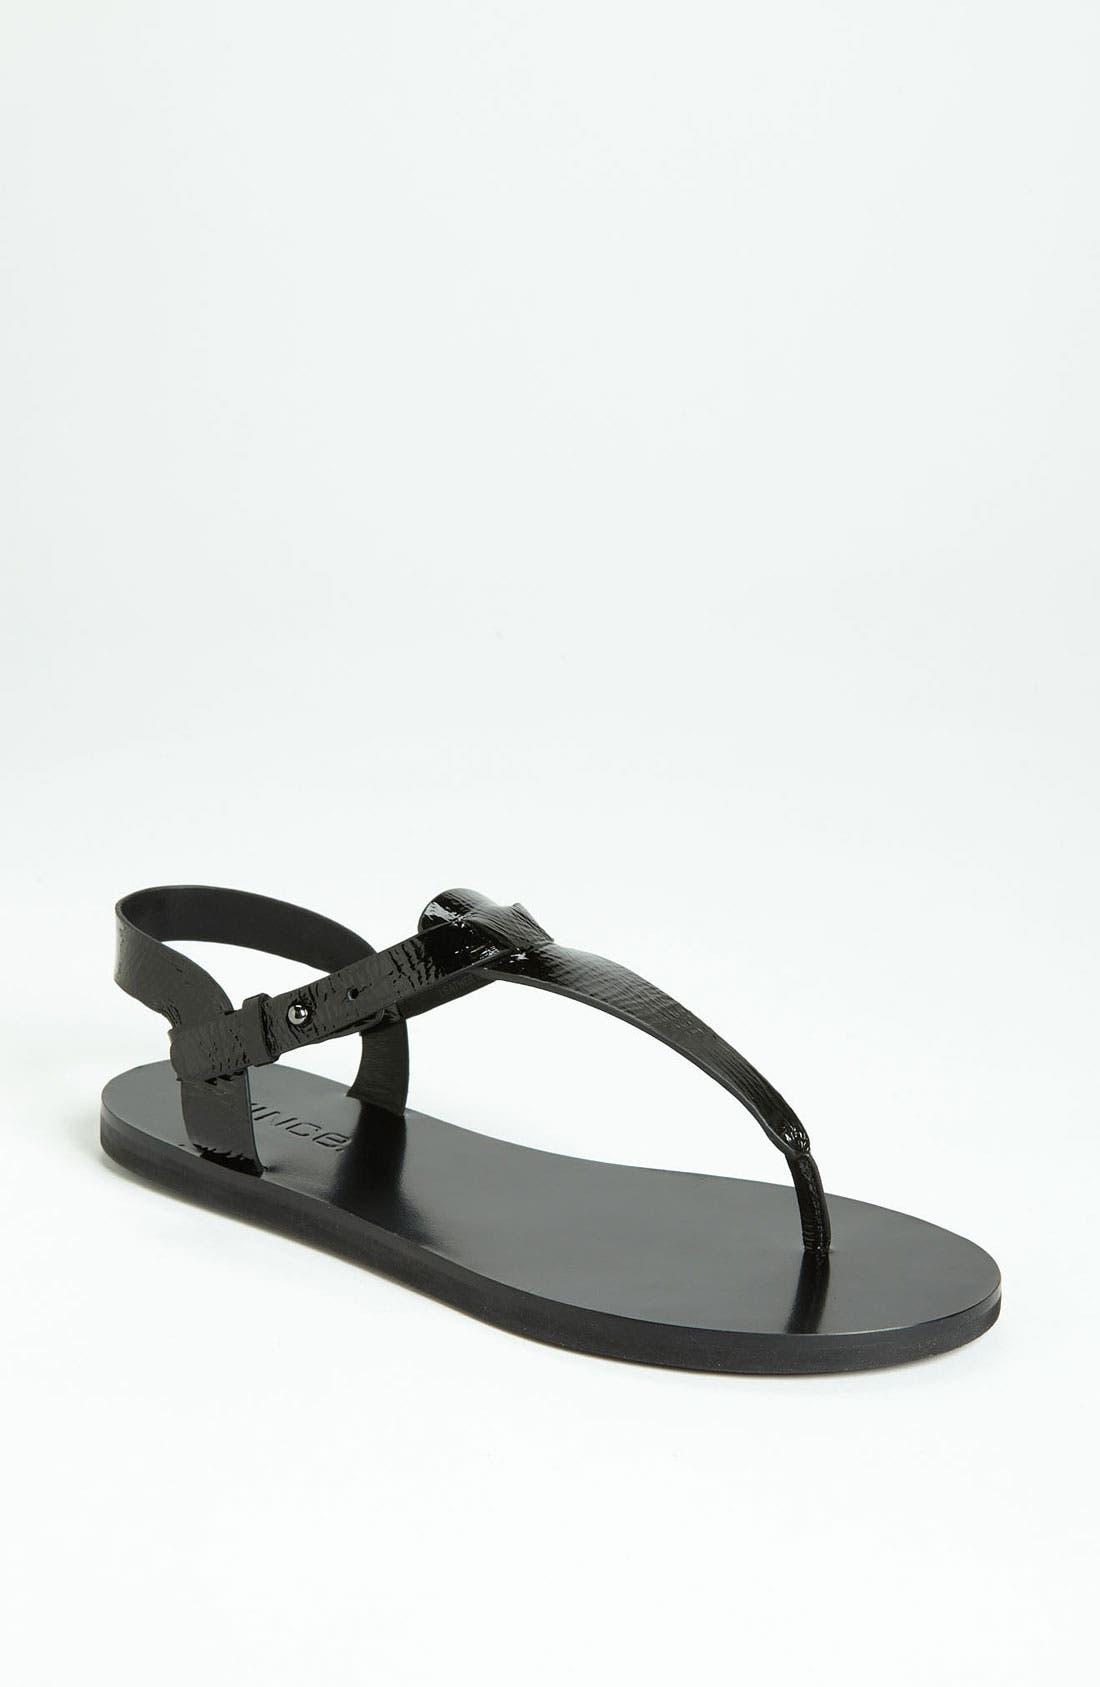 Alternate Image 1 Selected - Vince 'Maia' Sandal